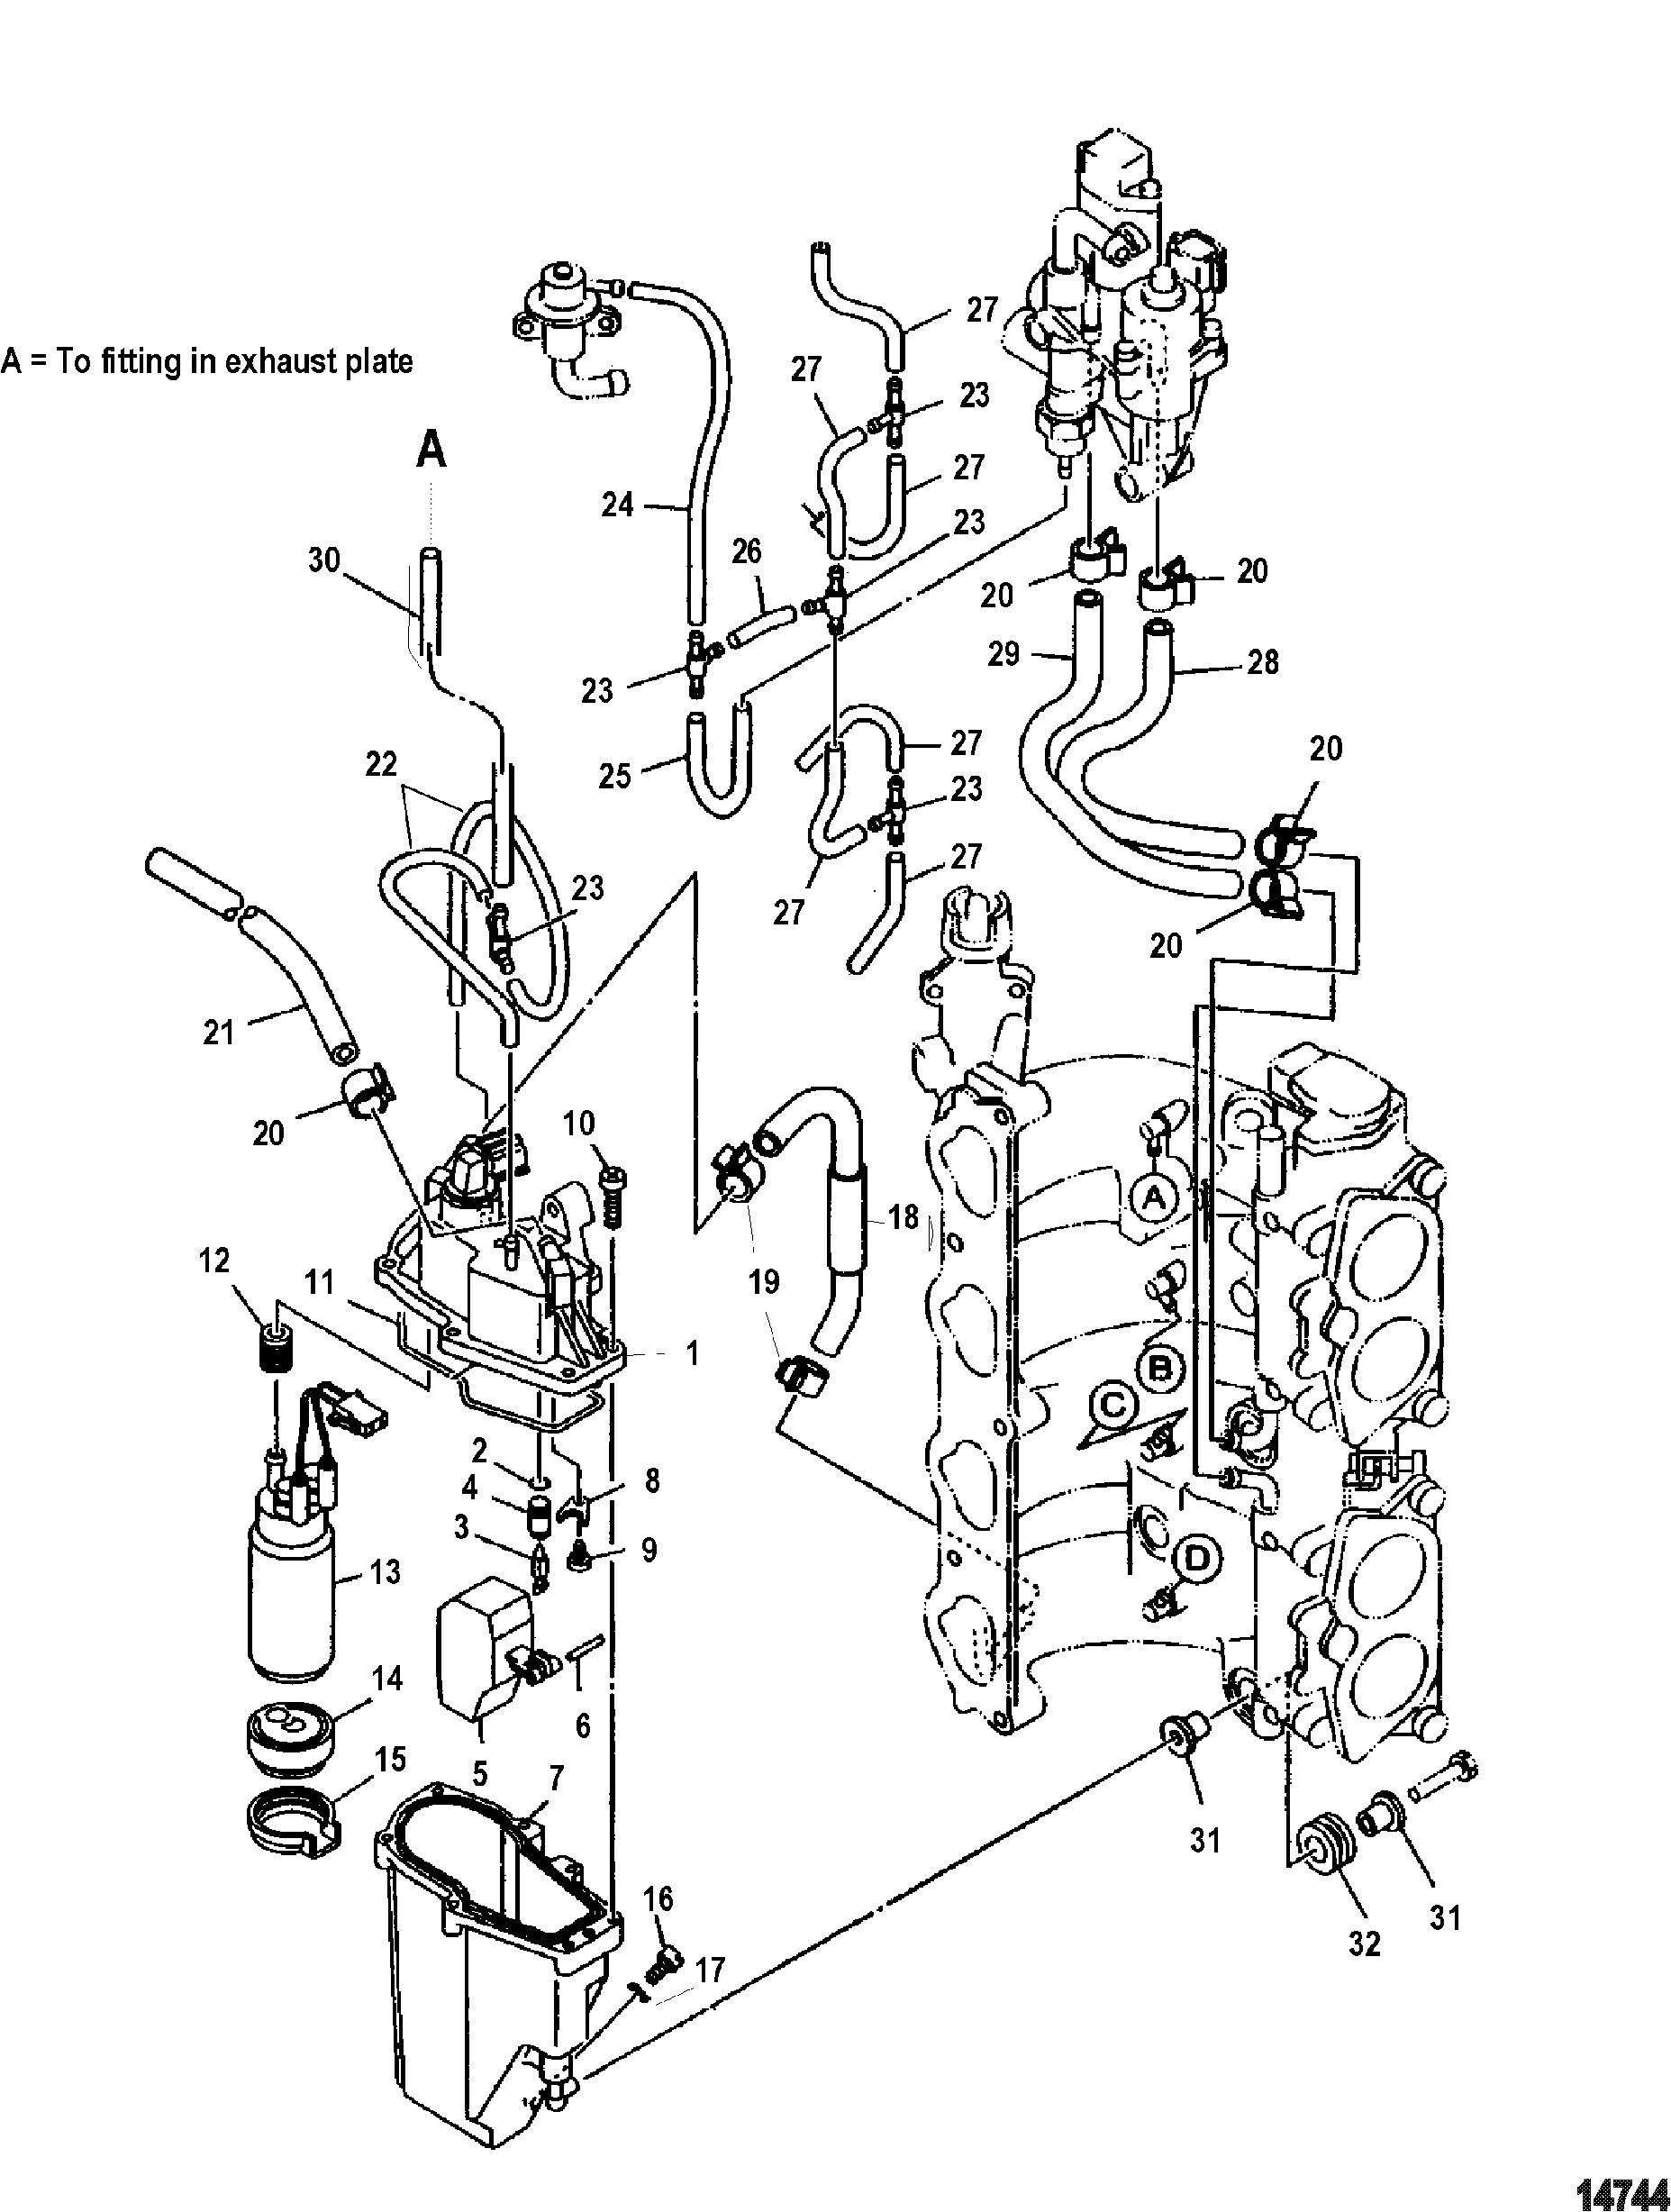 hight resolution of mercury mercury 115 efi 4 stroke 0t178500 thru 0t800999 stroke fuel line diagram on yamaha 115 4 stroke fuel line diagram